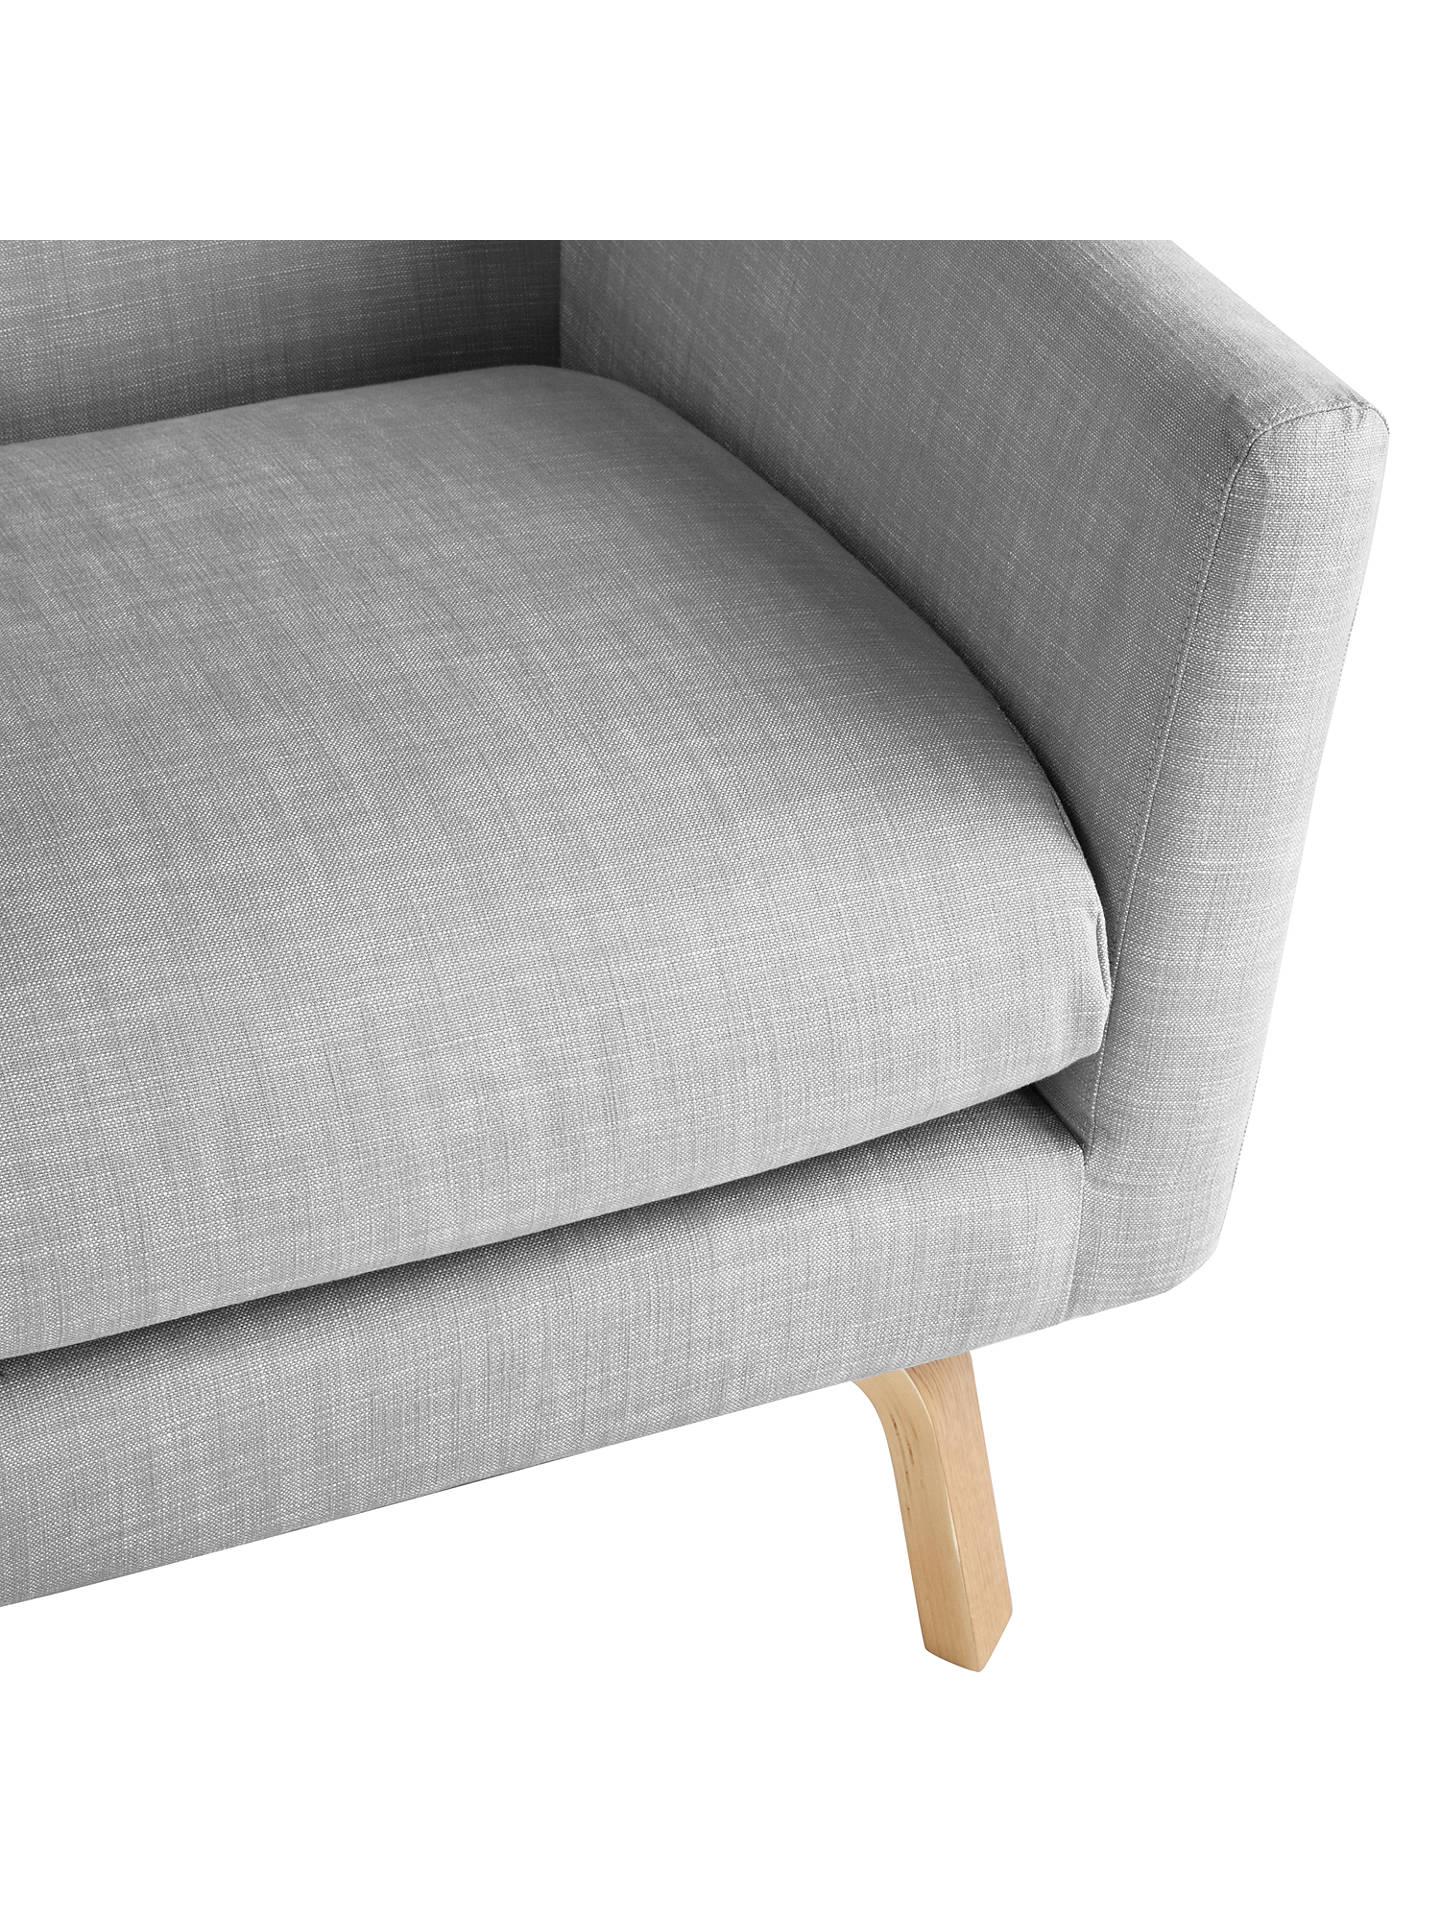 Outstanding House By John Lewis Archie Ii Small 2 Seater Sofa Creativecarmelina Interior Chair Design Creativecarmelinacom